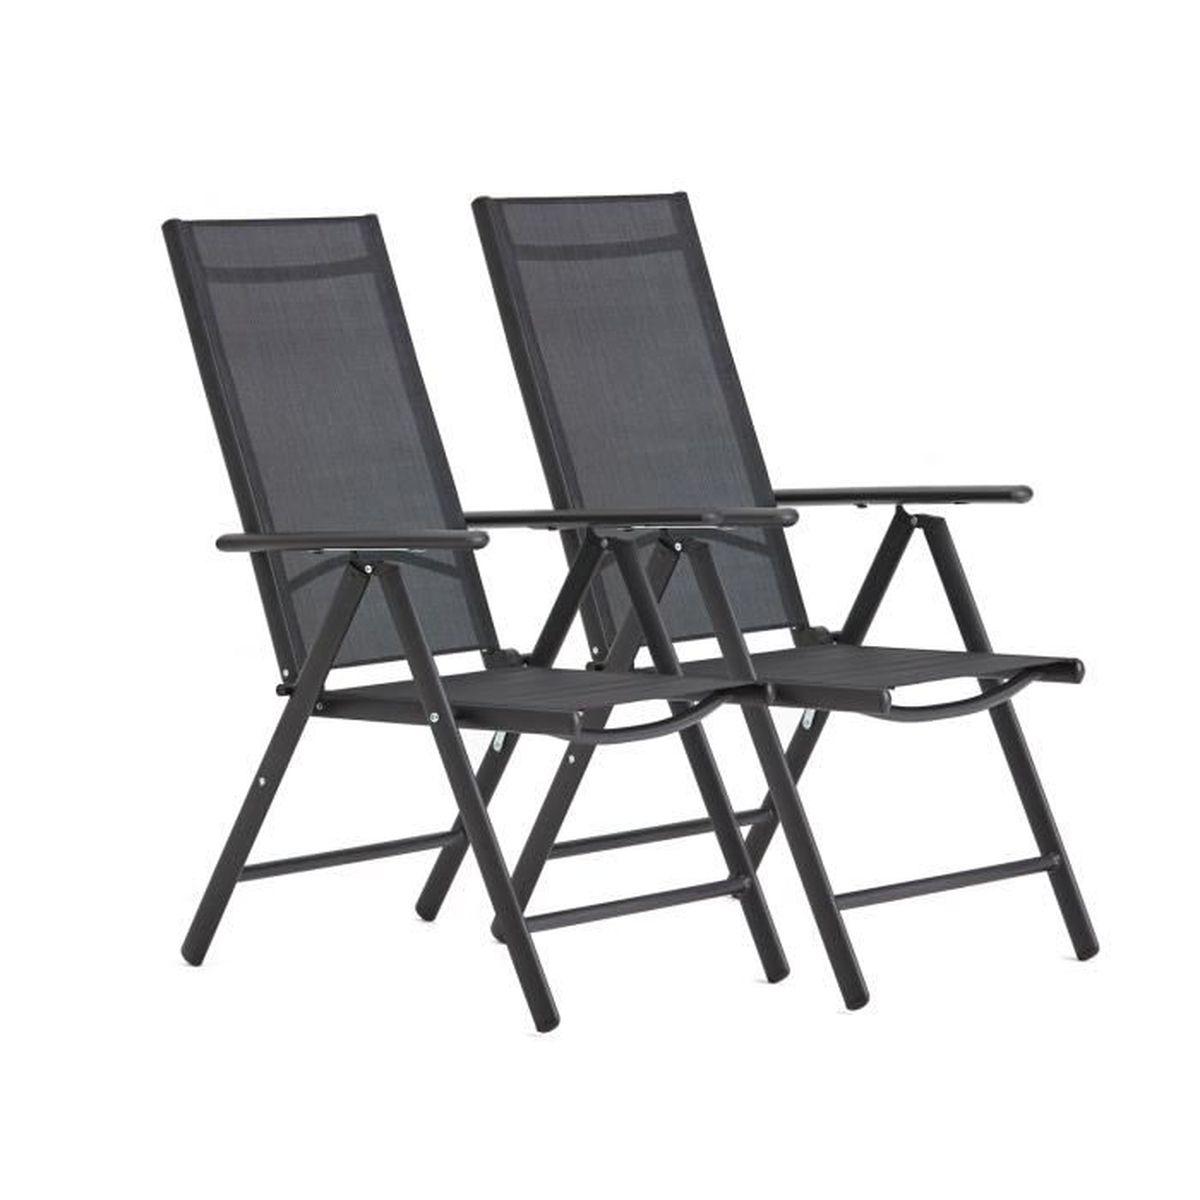 2x Chaise De Camping Jardin Plage balcon extérieur pliante Chaise pliante chaise Angel